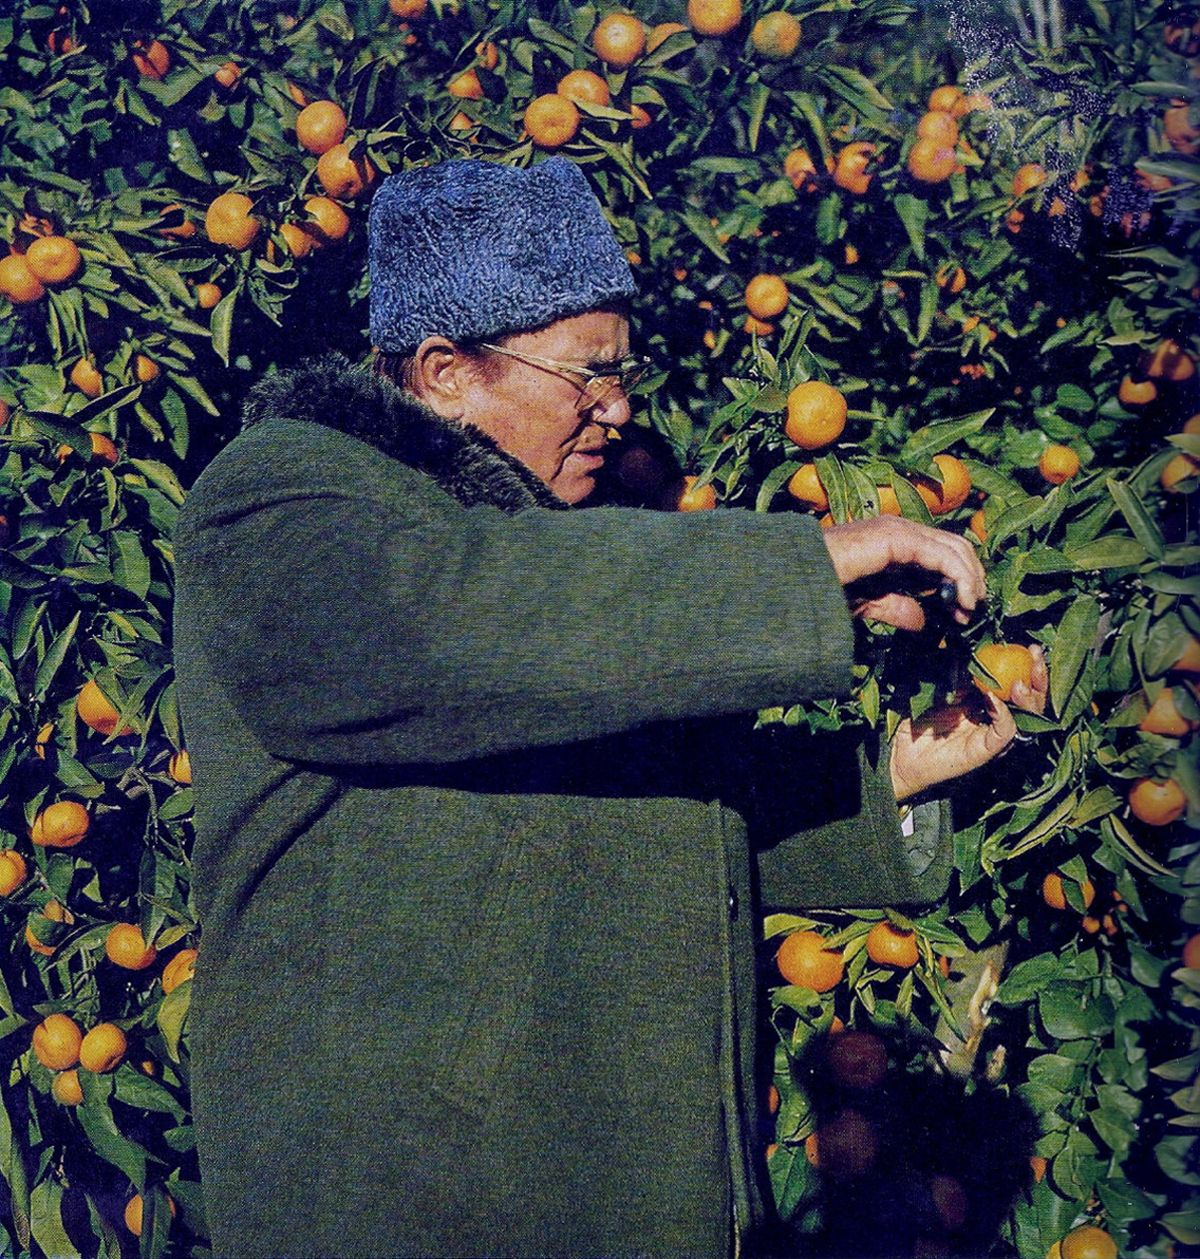 Josip Broz Tito picking up mandarines on the island of Brijuni, Croatia  Josip Broz Tito bere mandarine na ostrvu Brijuni, Hrvatska  [1960s]